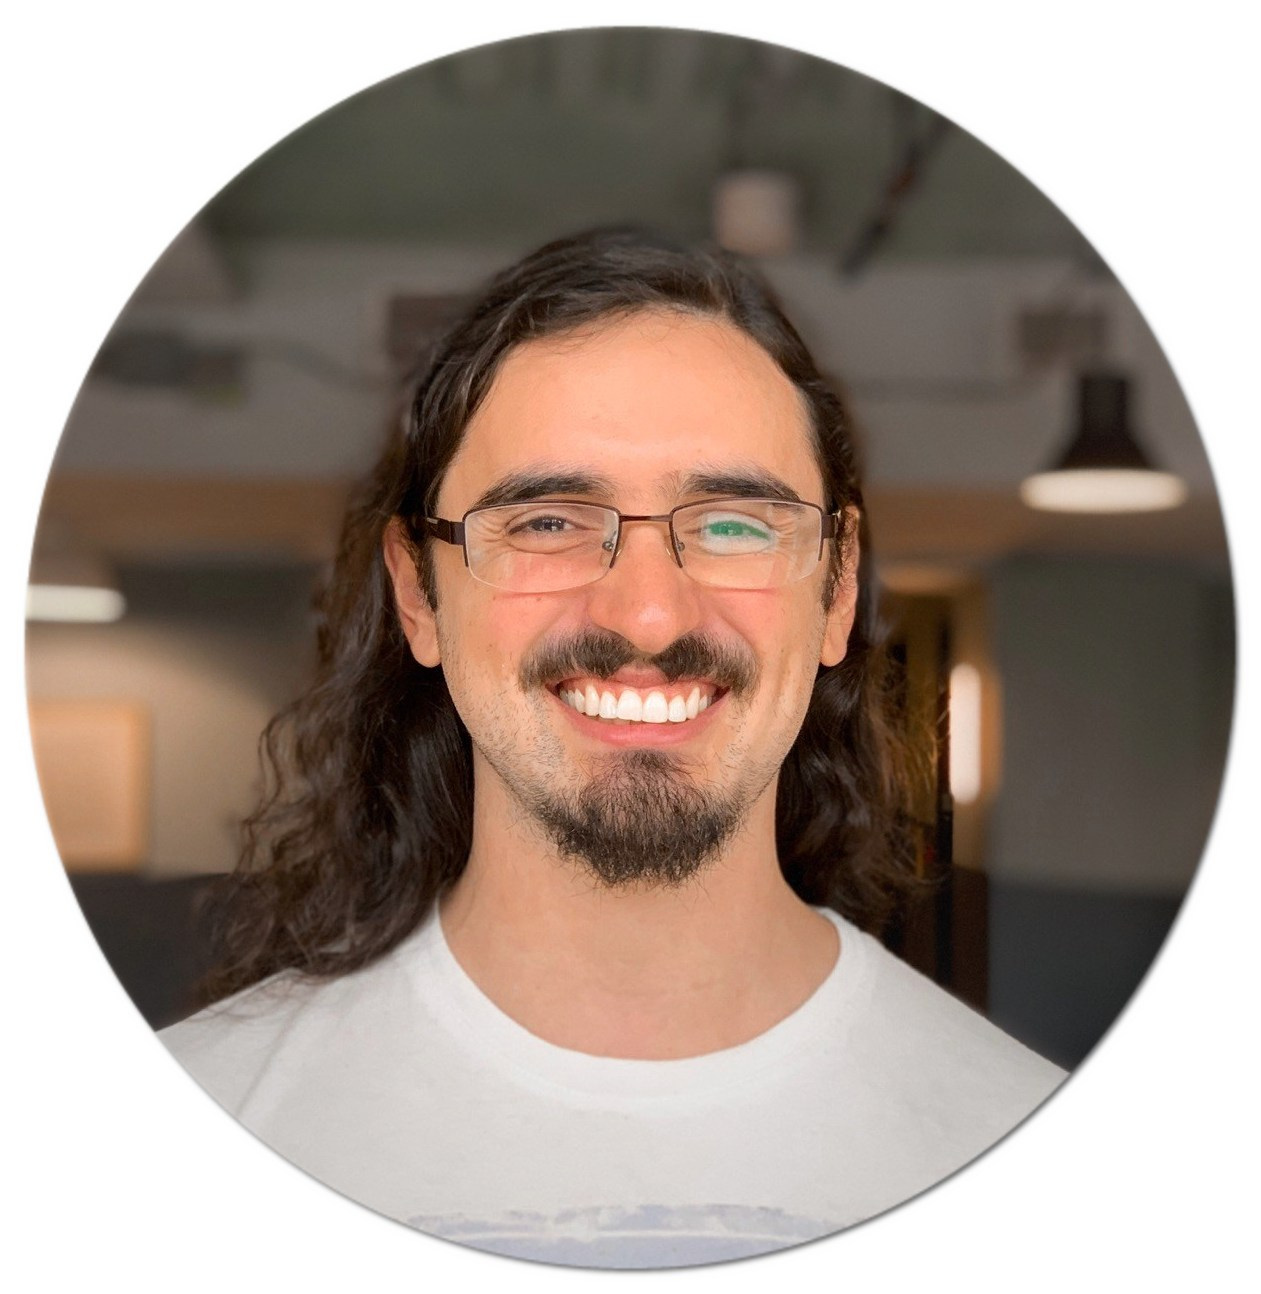 Mardo del Cid - Software Developer